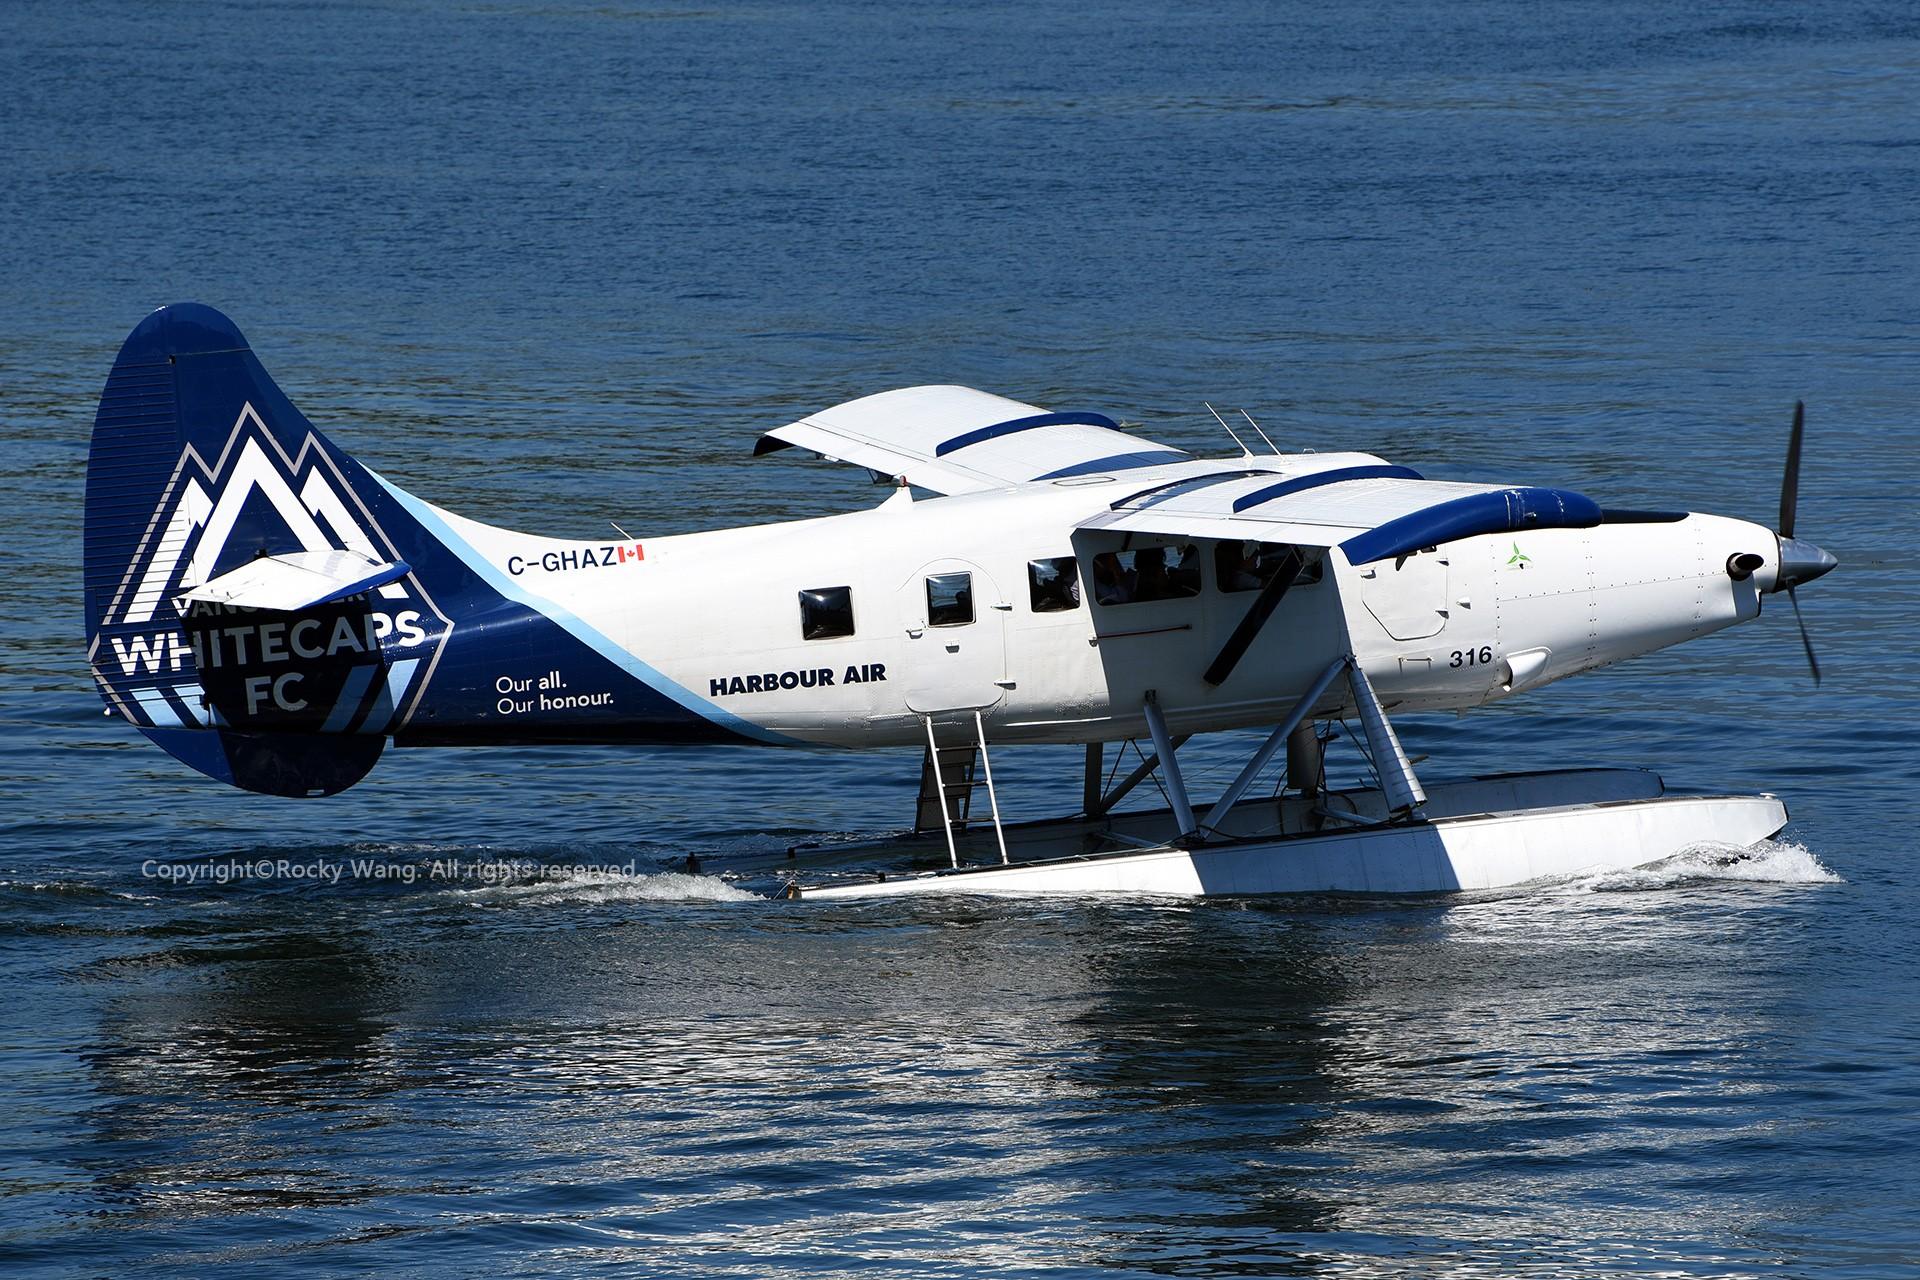 Re:[原创]简易版游记,纪念一次30段的环球飞行和一些碎碎念 DE HAVILLAND CANADA DHC-3T VAZAR TURBINE OTTER C-GHAZ Vancouver Harbour